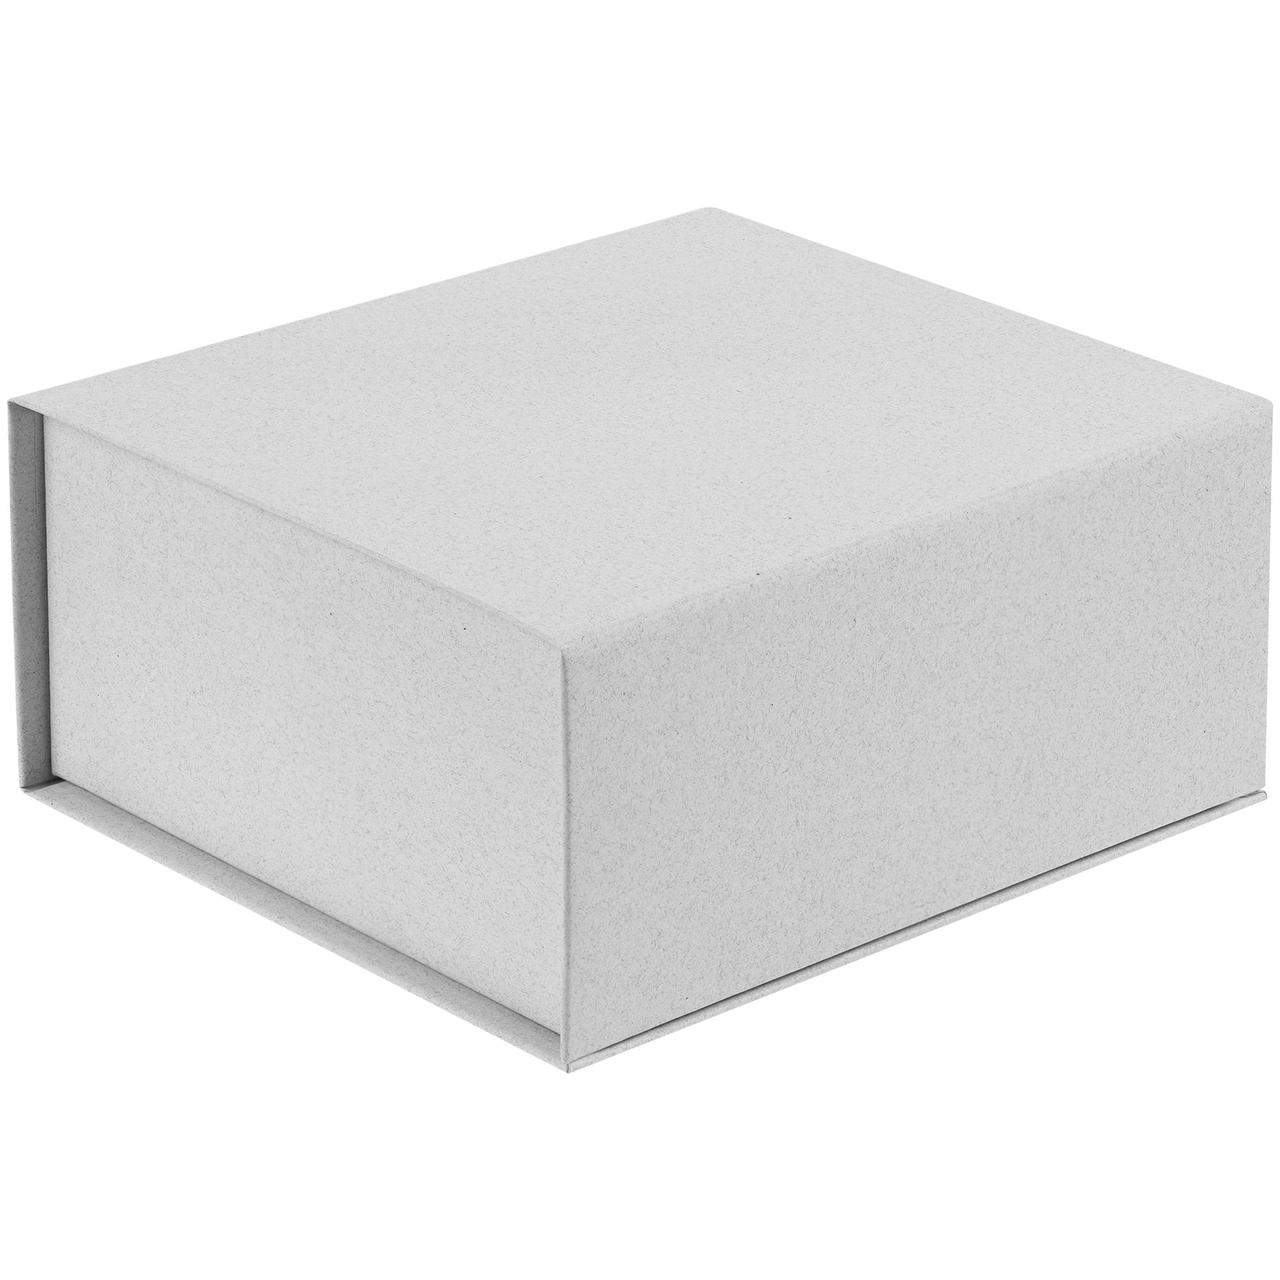 Коробка Eco Style, белая (артикул 72001.60)